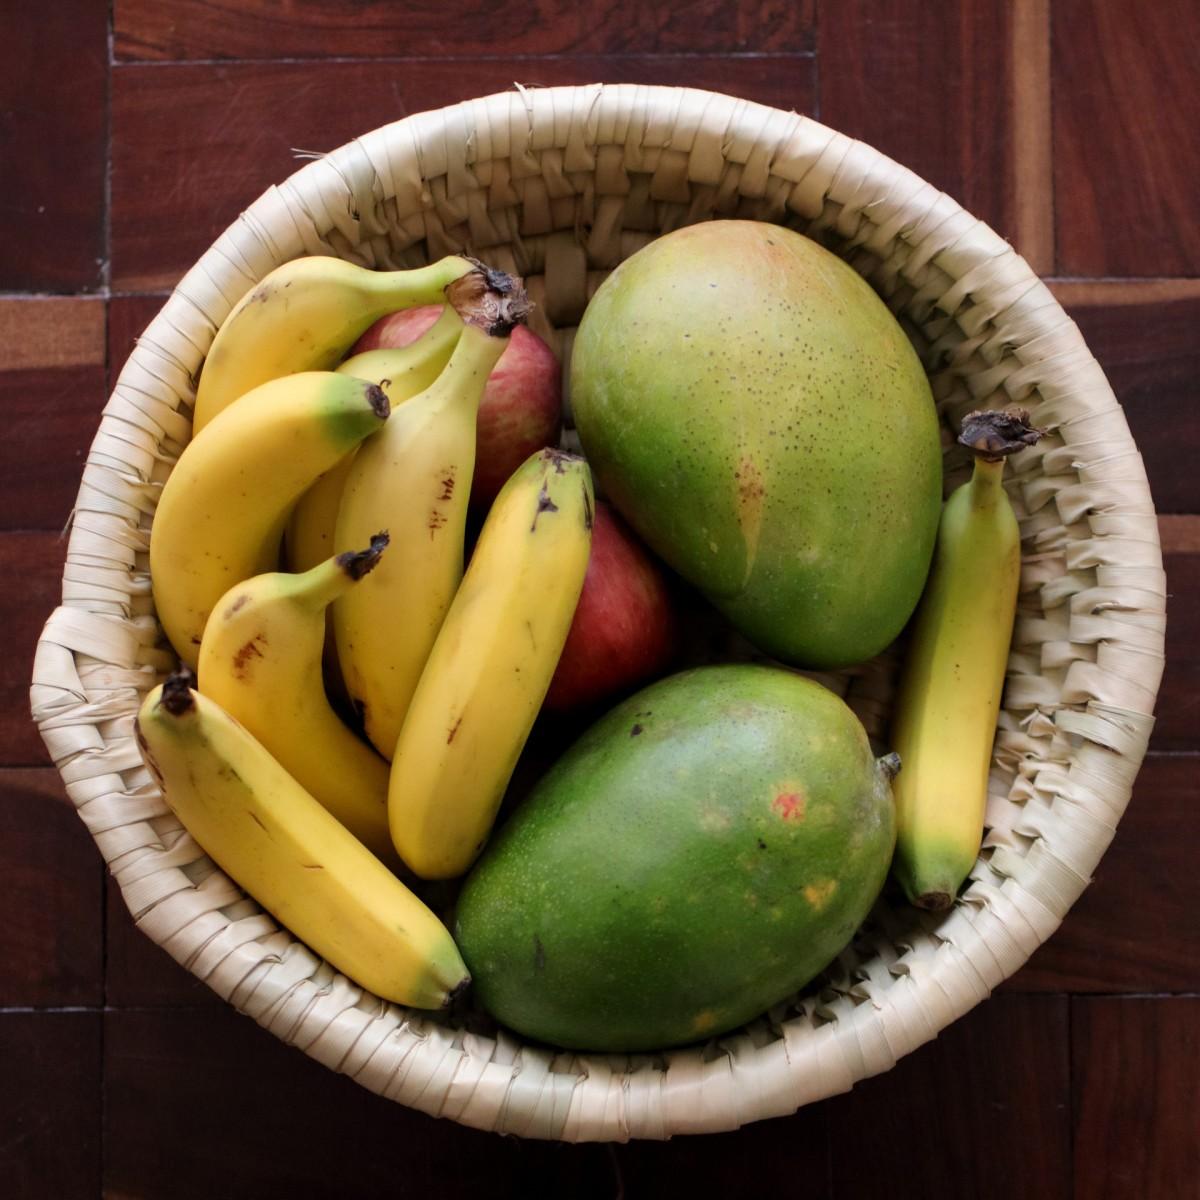 Ripen Mangoes in a Fruitbowl